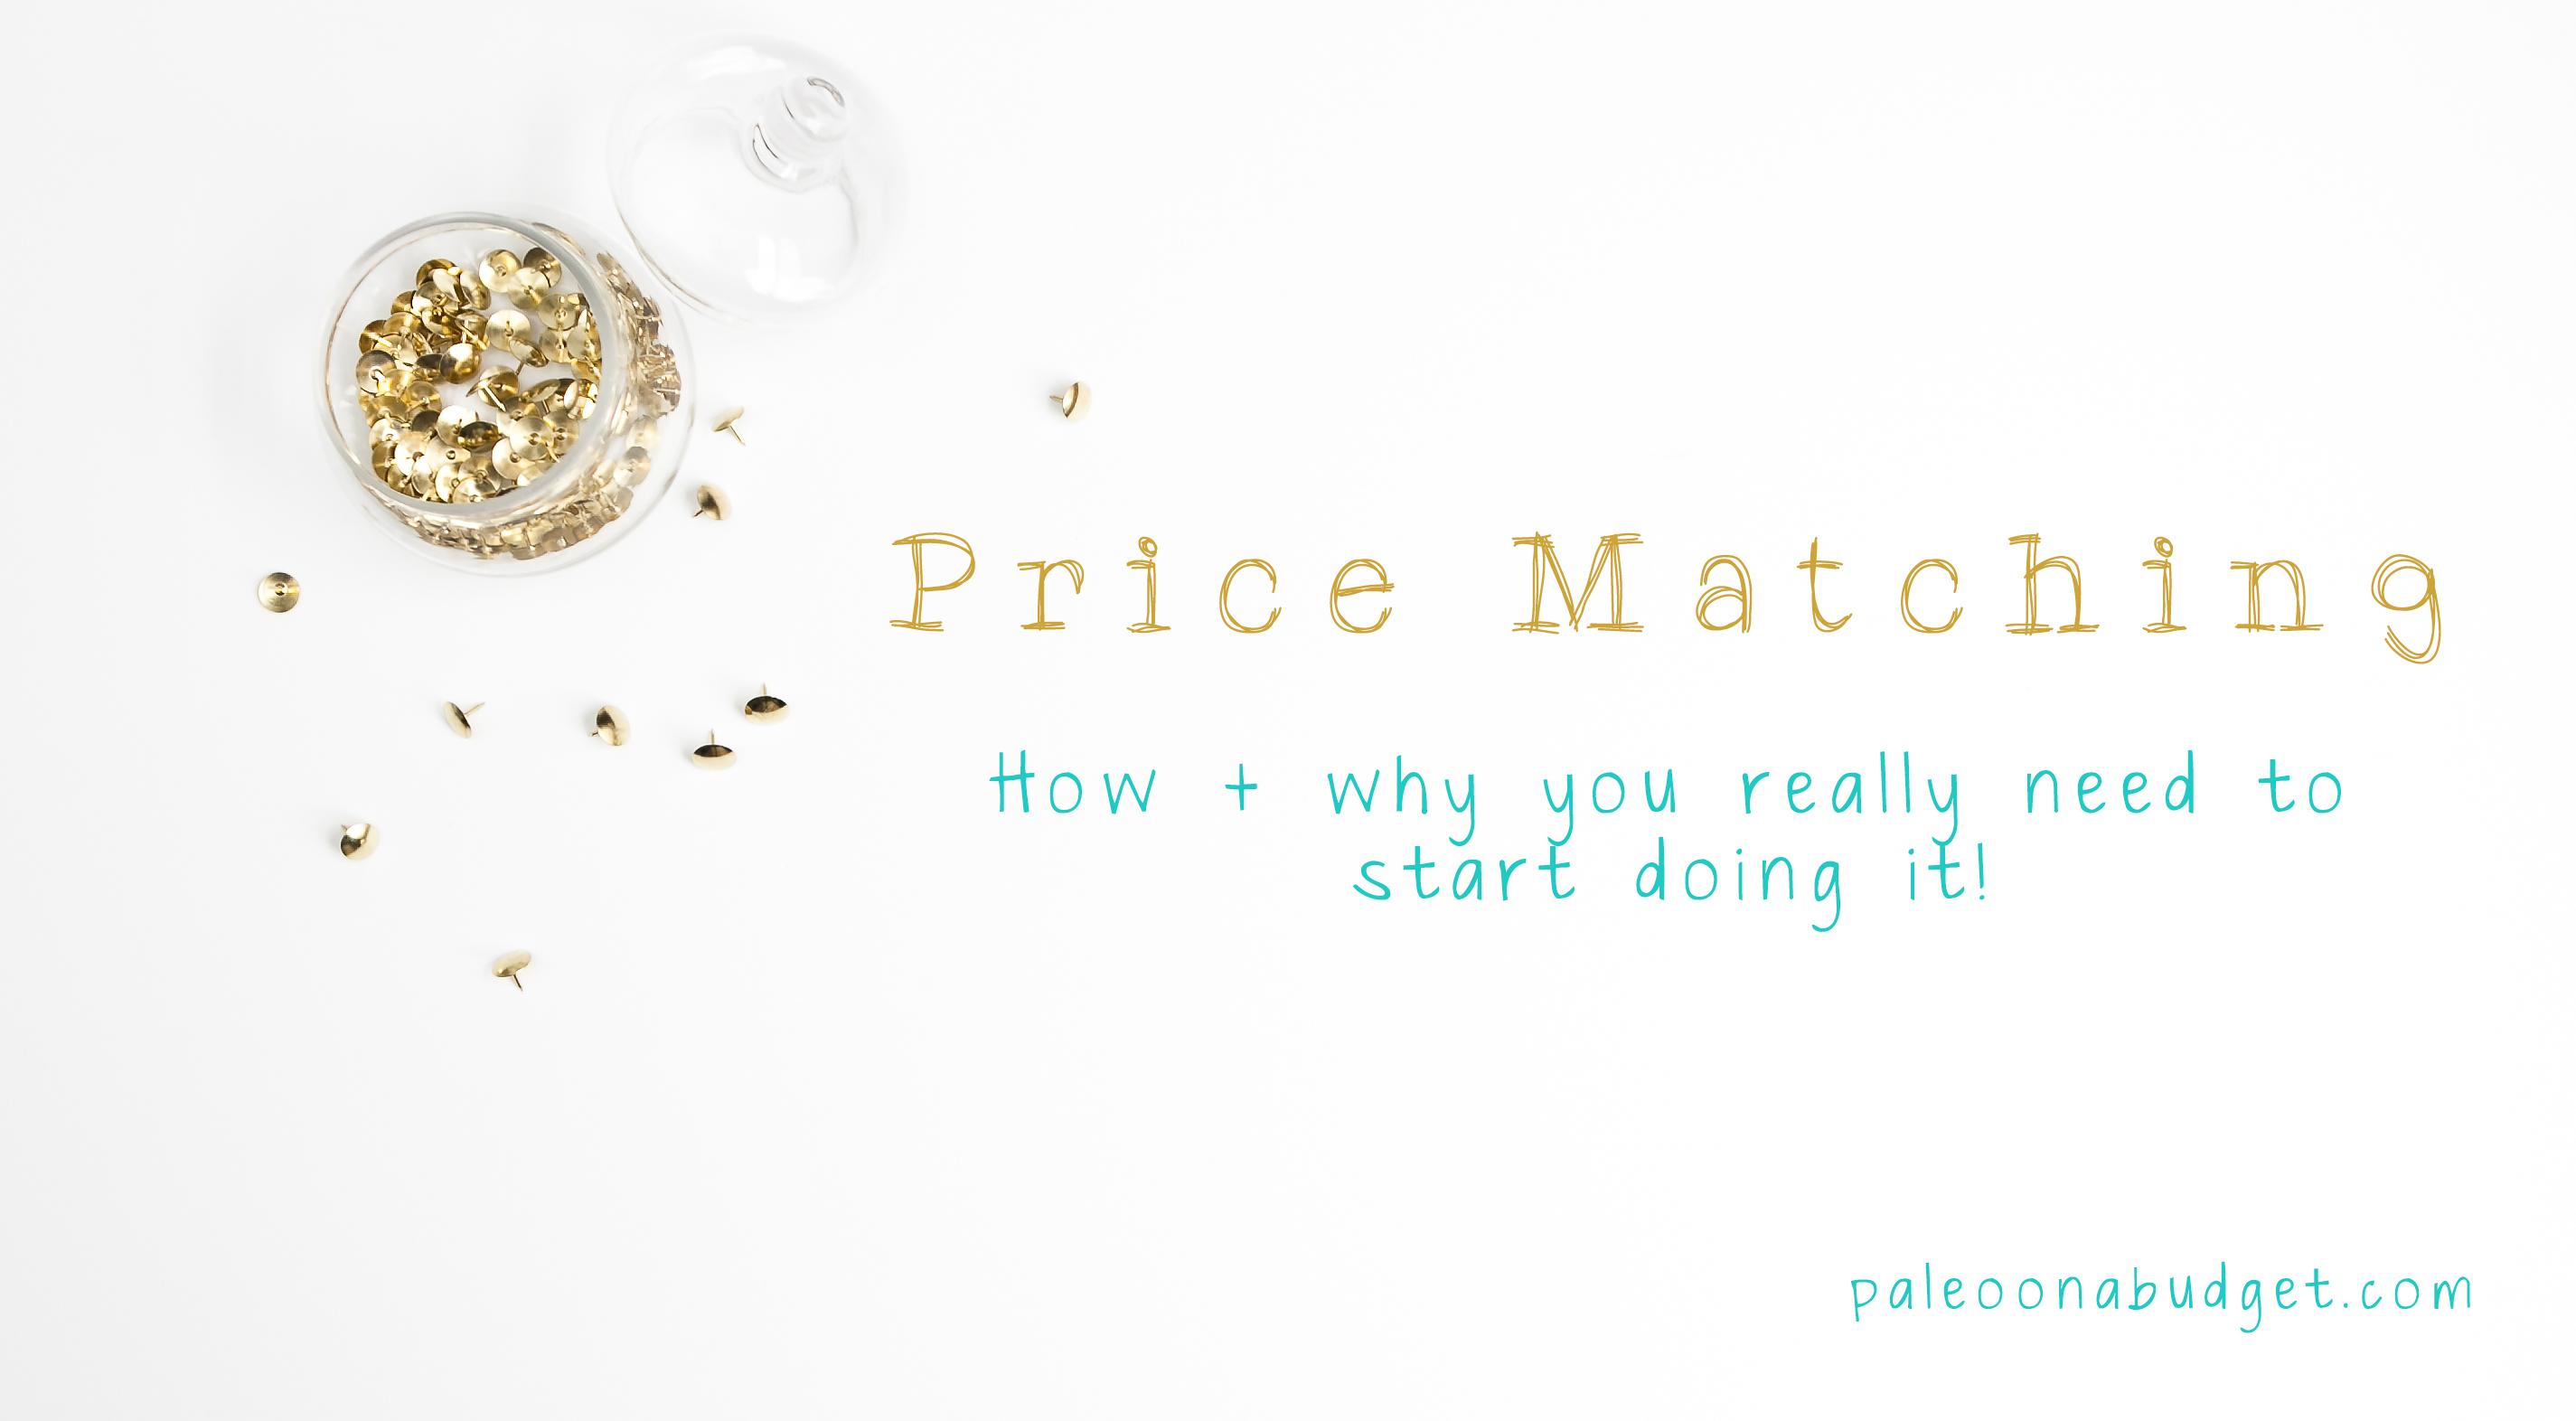 Let's talk Price Matching!